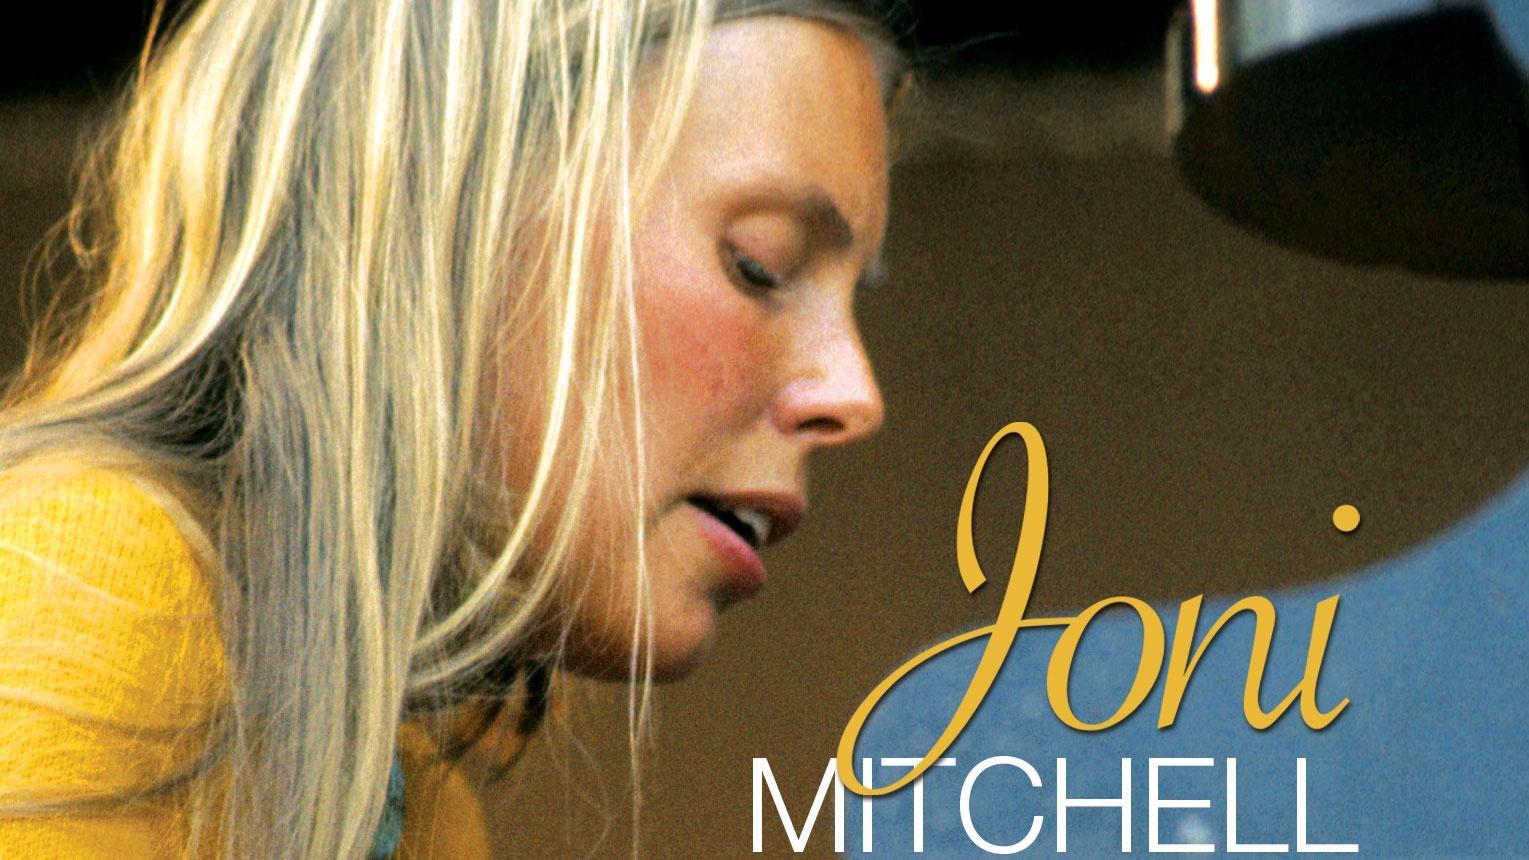 Joni Mitchell